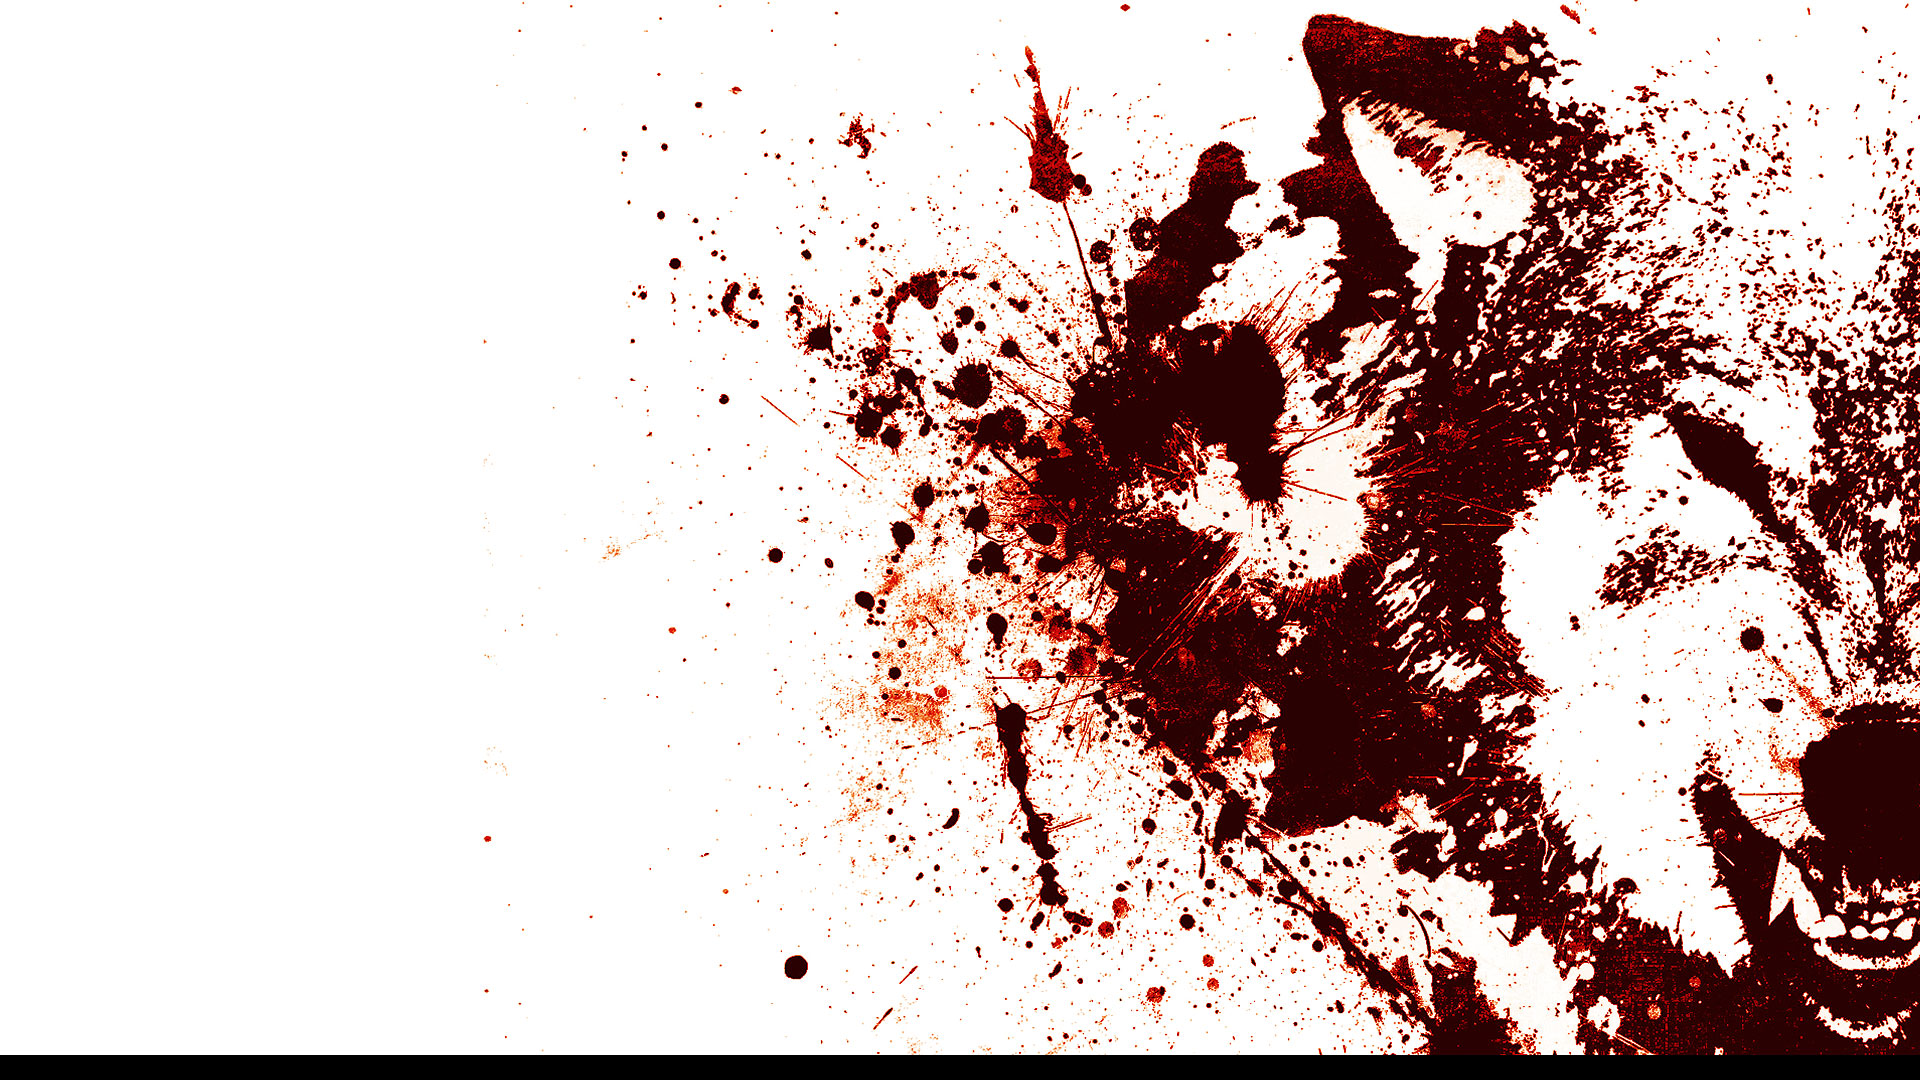 Wolf Hd Wallpaper Background Image 1920x1080 Id 294045